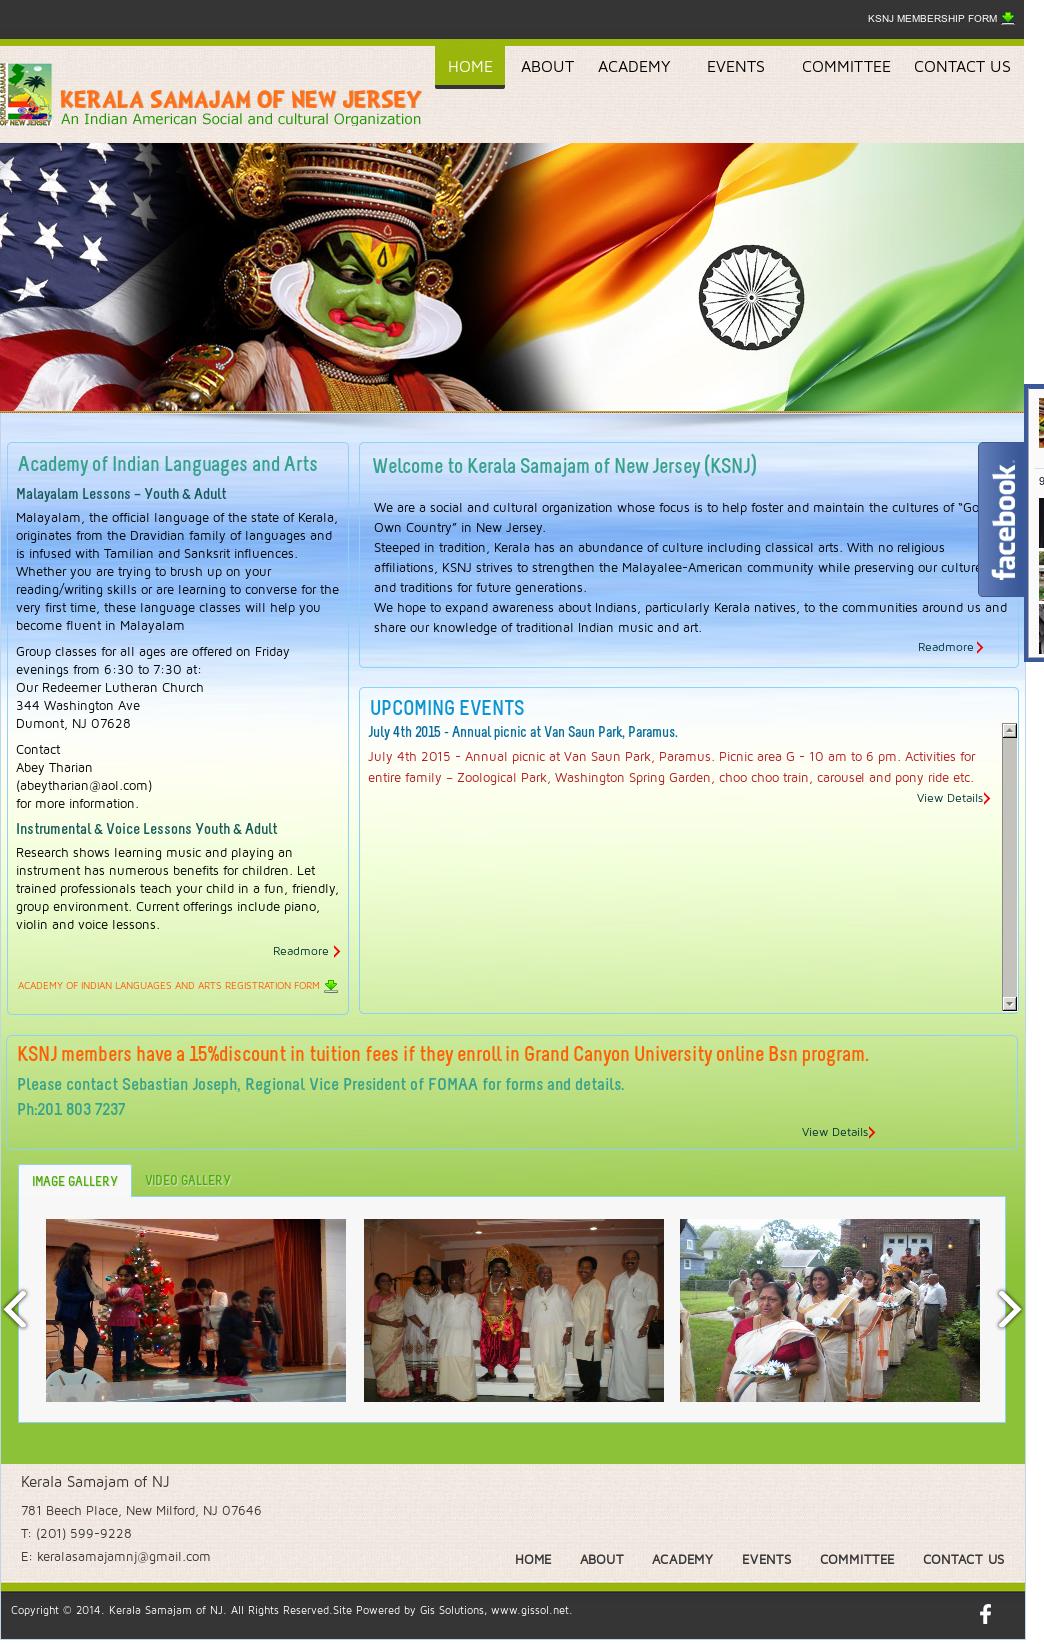 Keralasamajamnj Competitors, Revenue and Employees - Owler